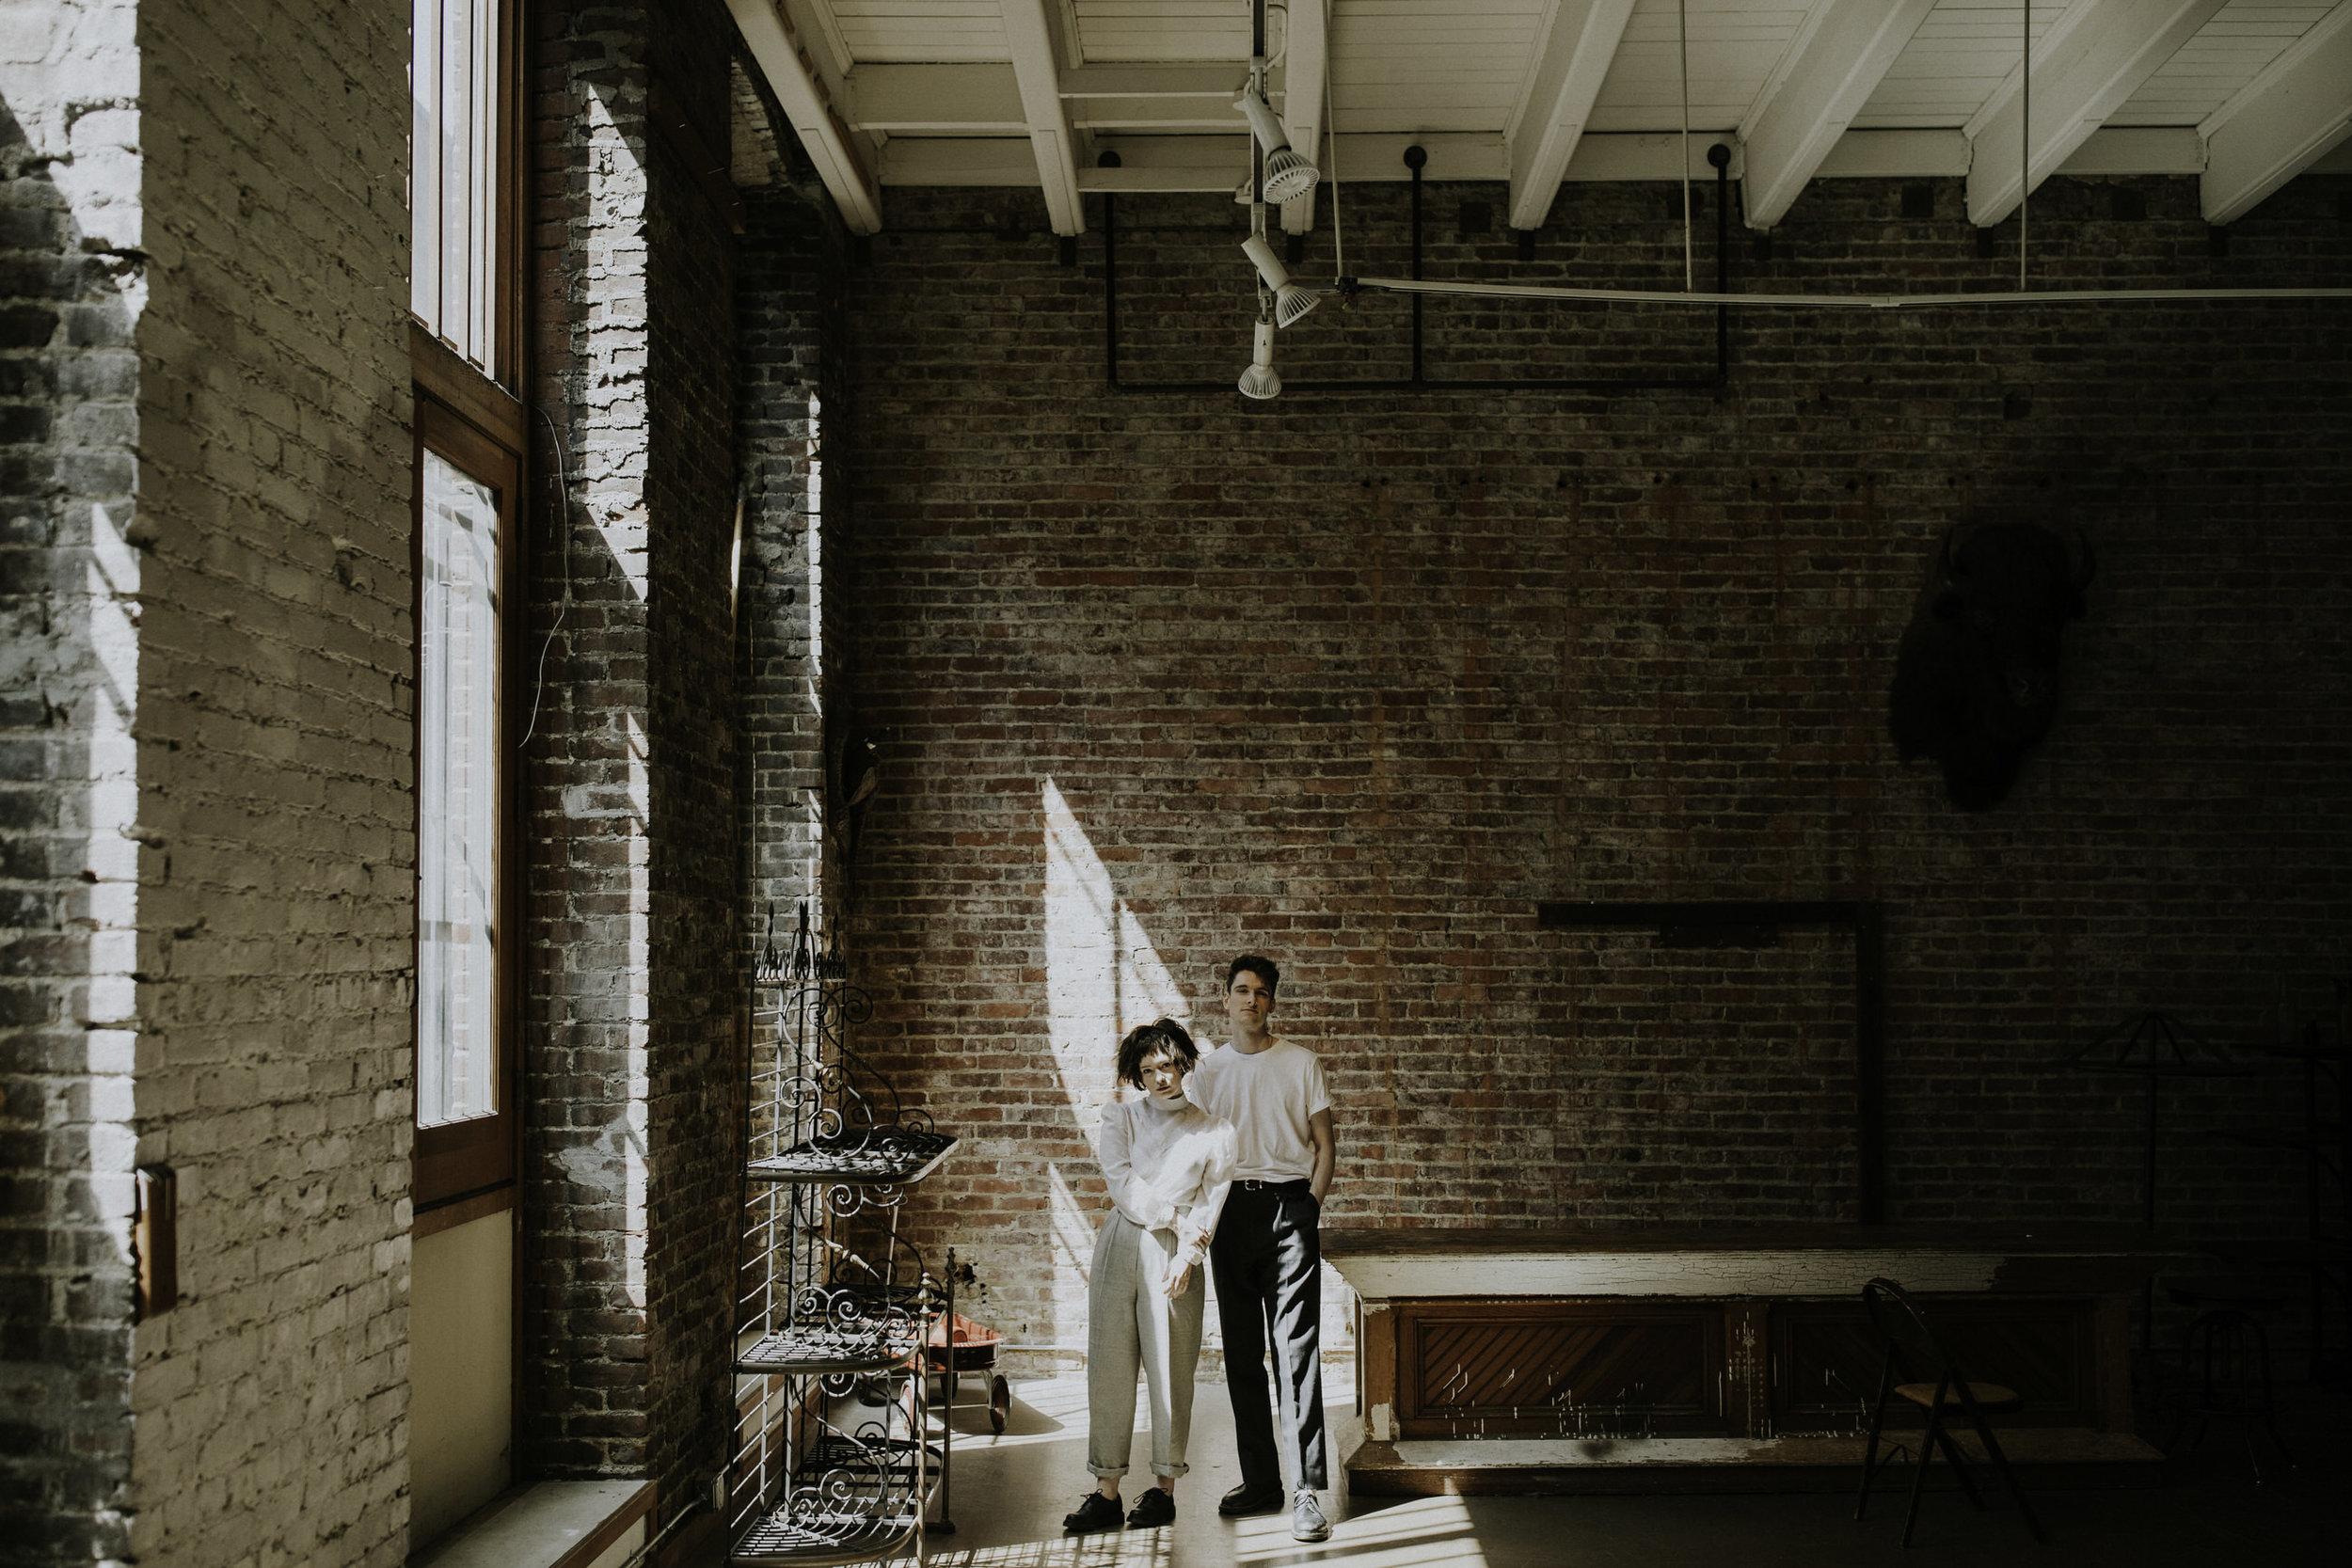 Majken&Luke_wedding photographer seattle16.jpg